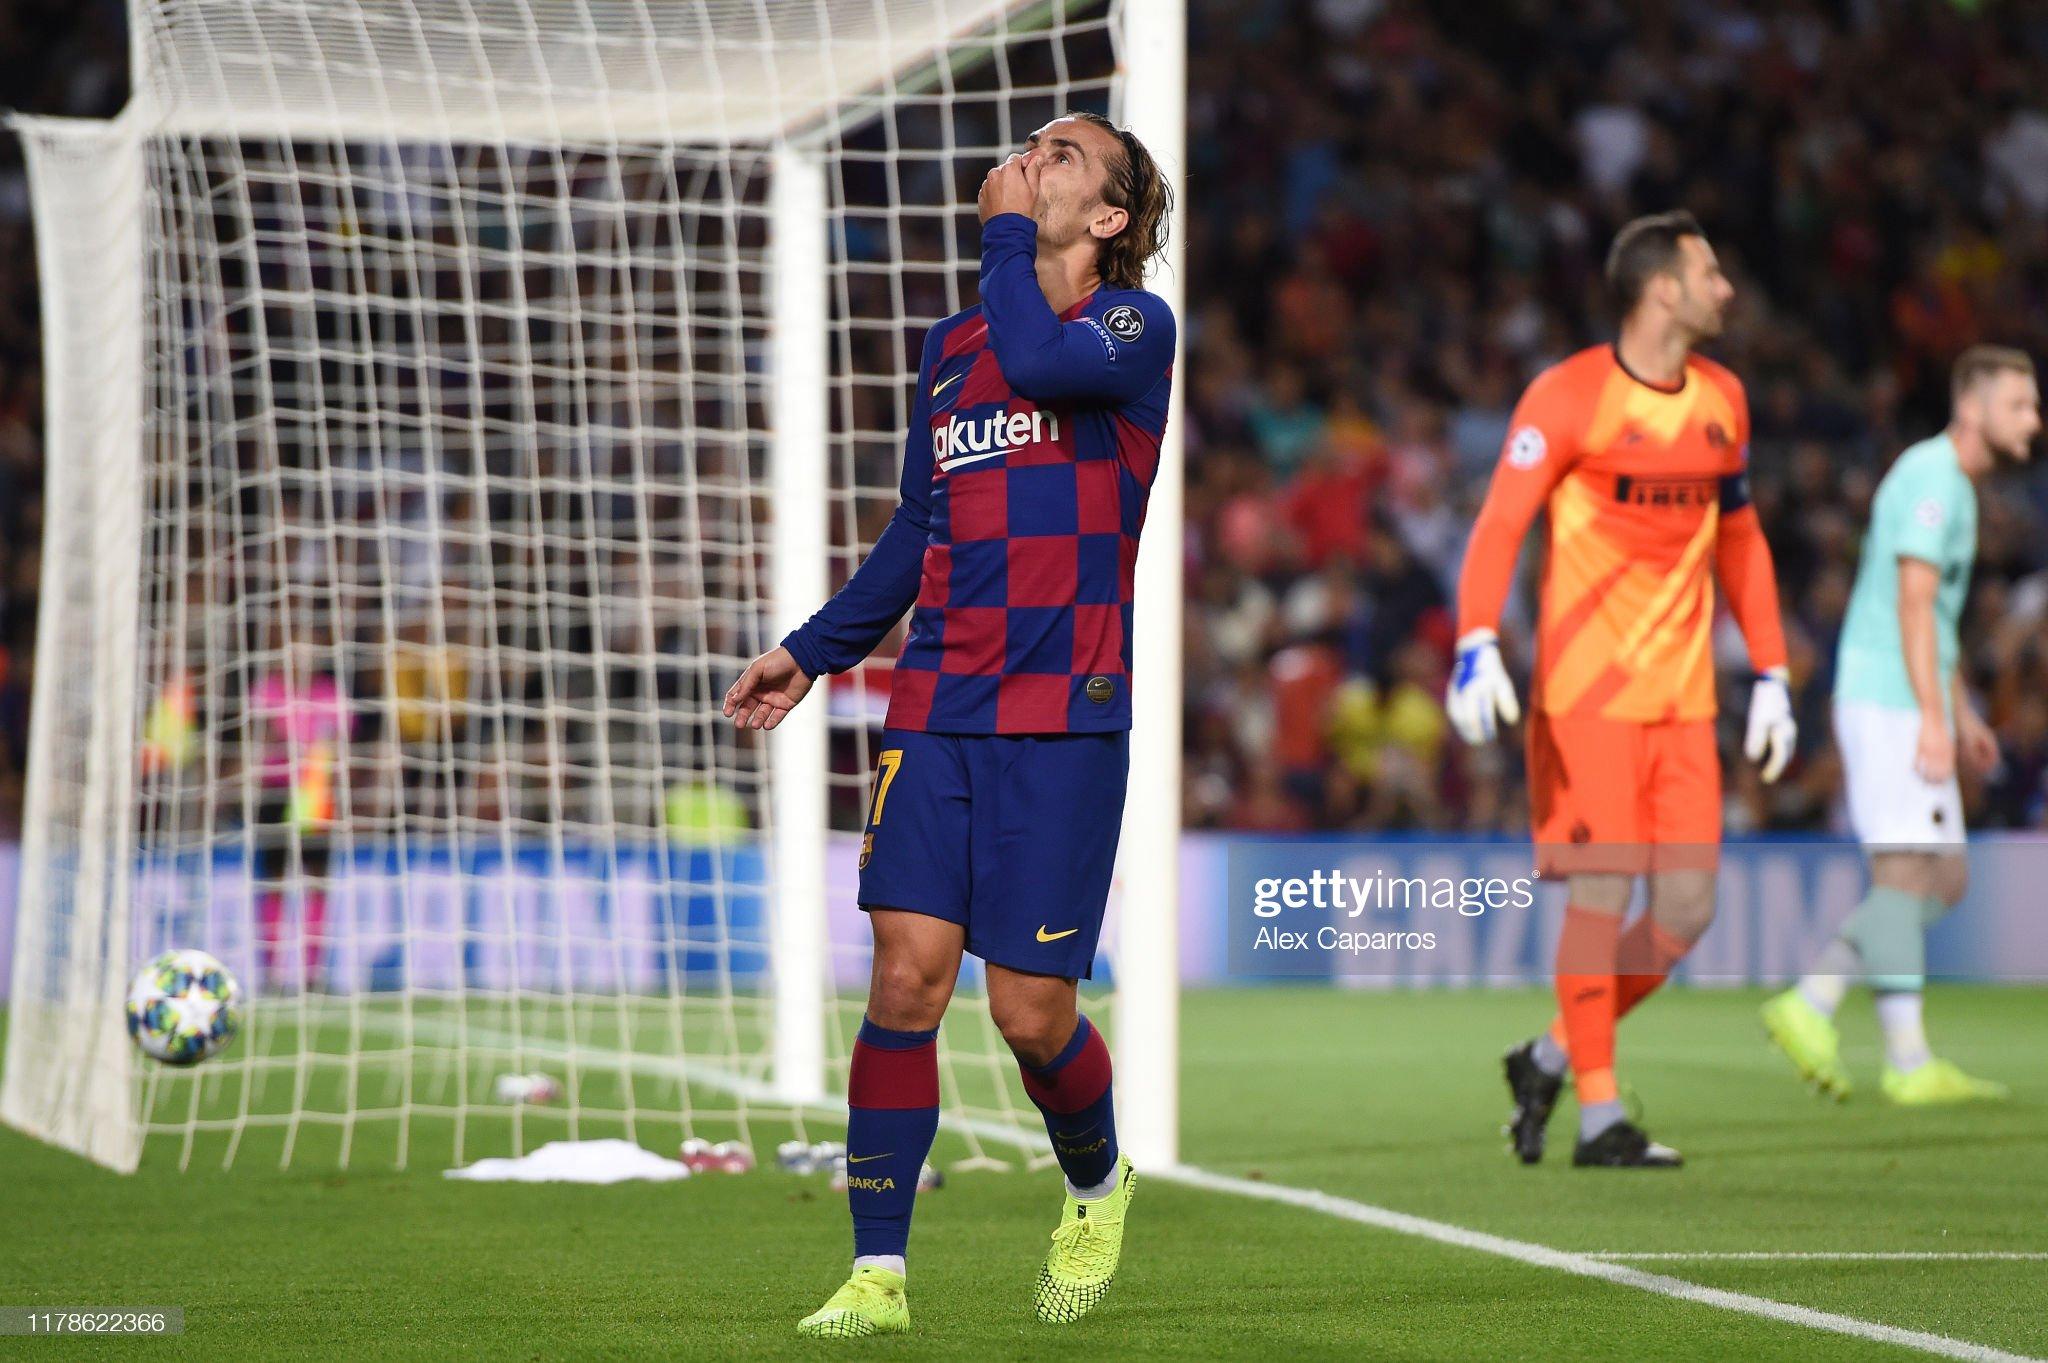 صور مباراة : برشلونة - إنتر 2-1 ( 02-10-2019 )  Antoine-griezmann-of-fc-barcelona-reacts-during-the-uefa-champions-picture-id1178622366?s=2048x2048